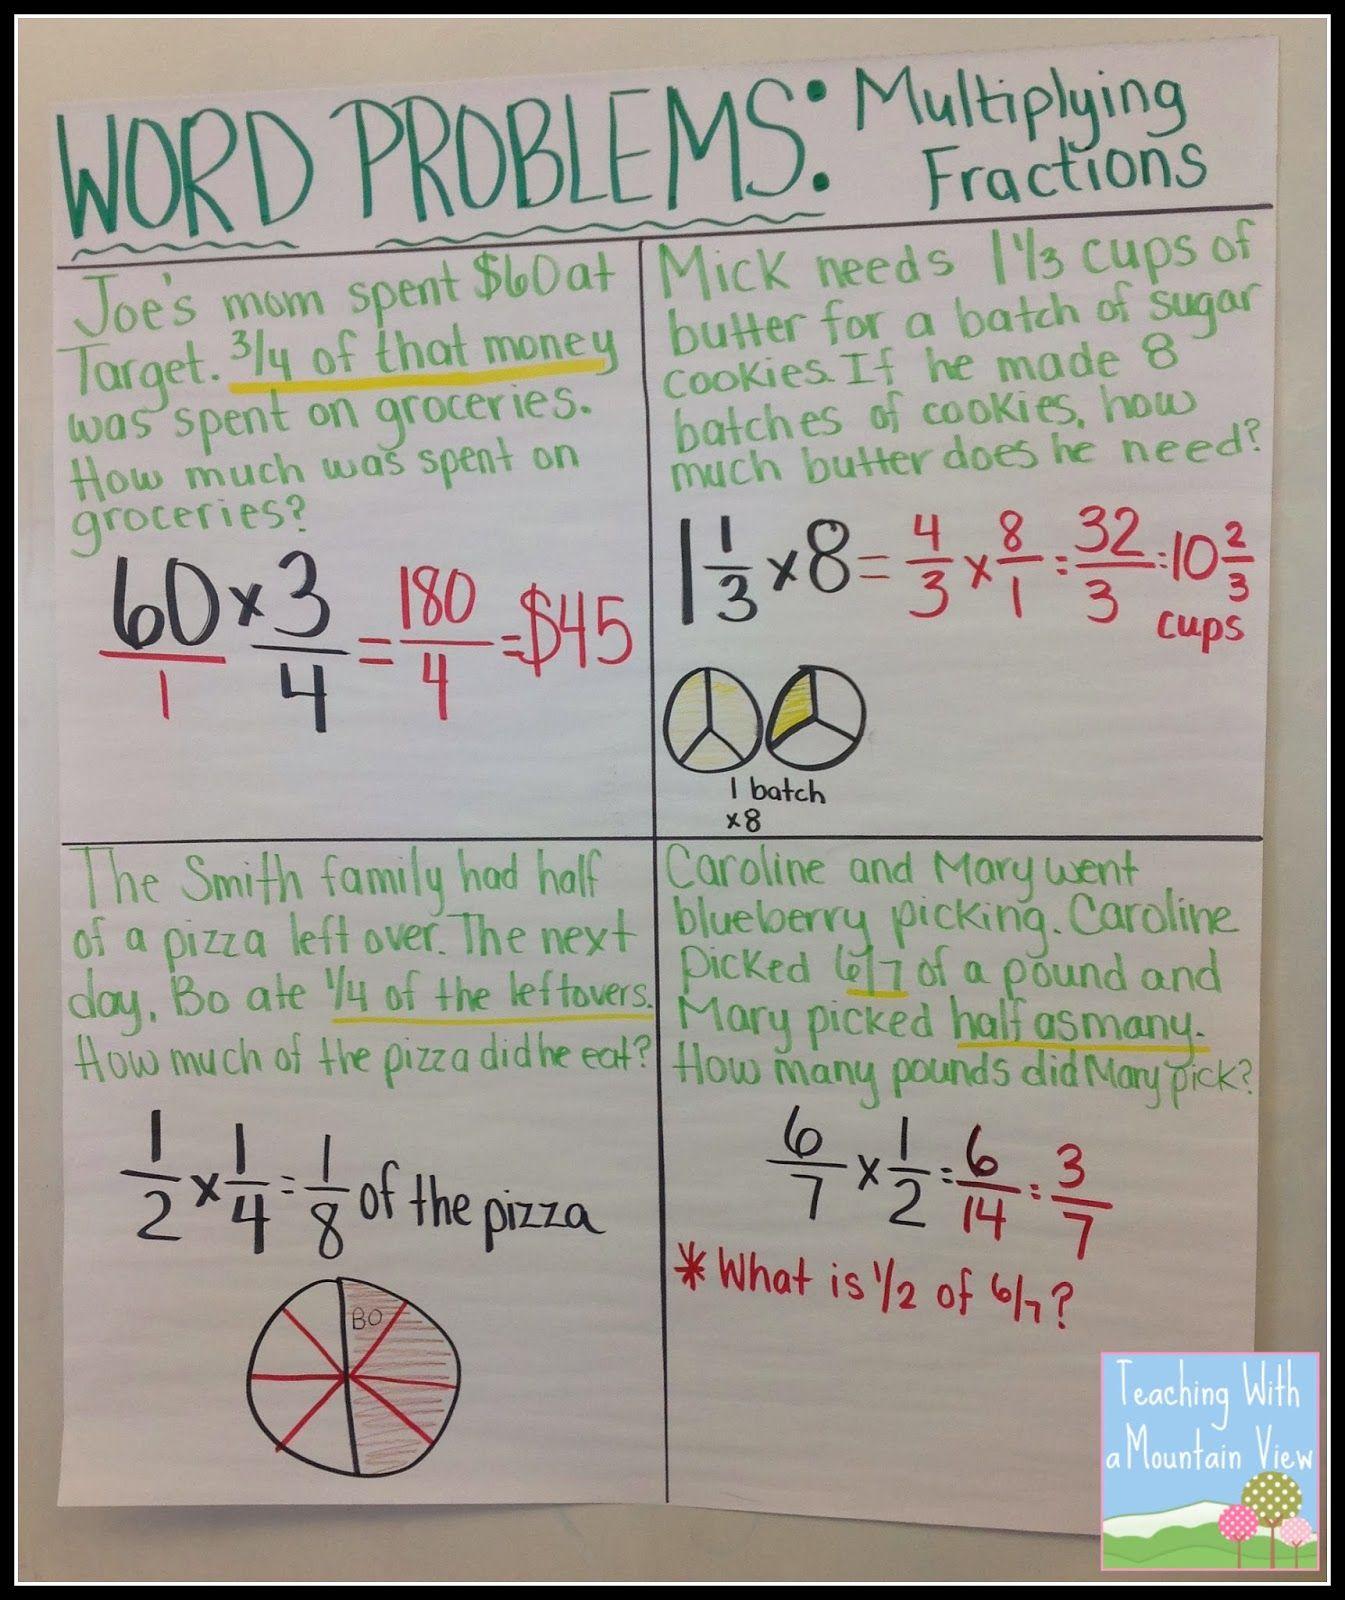 worksheet Fraction Word Problems 5th Grade making sense of multiplying dividing fractions word problems problems